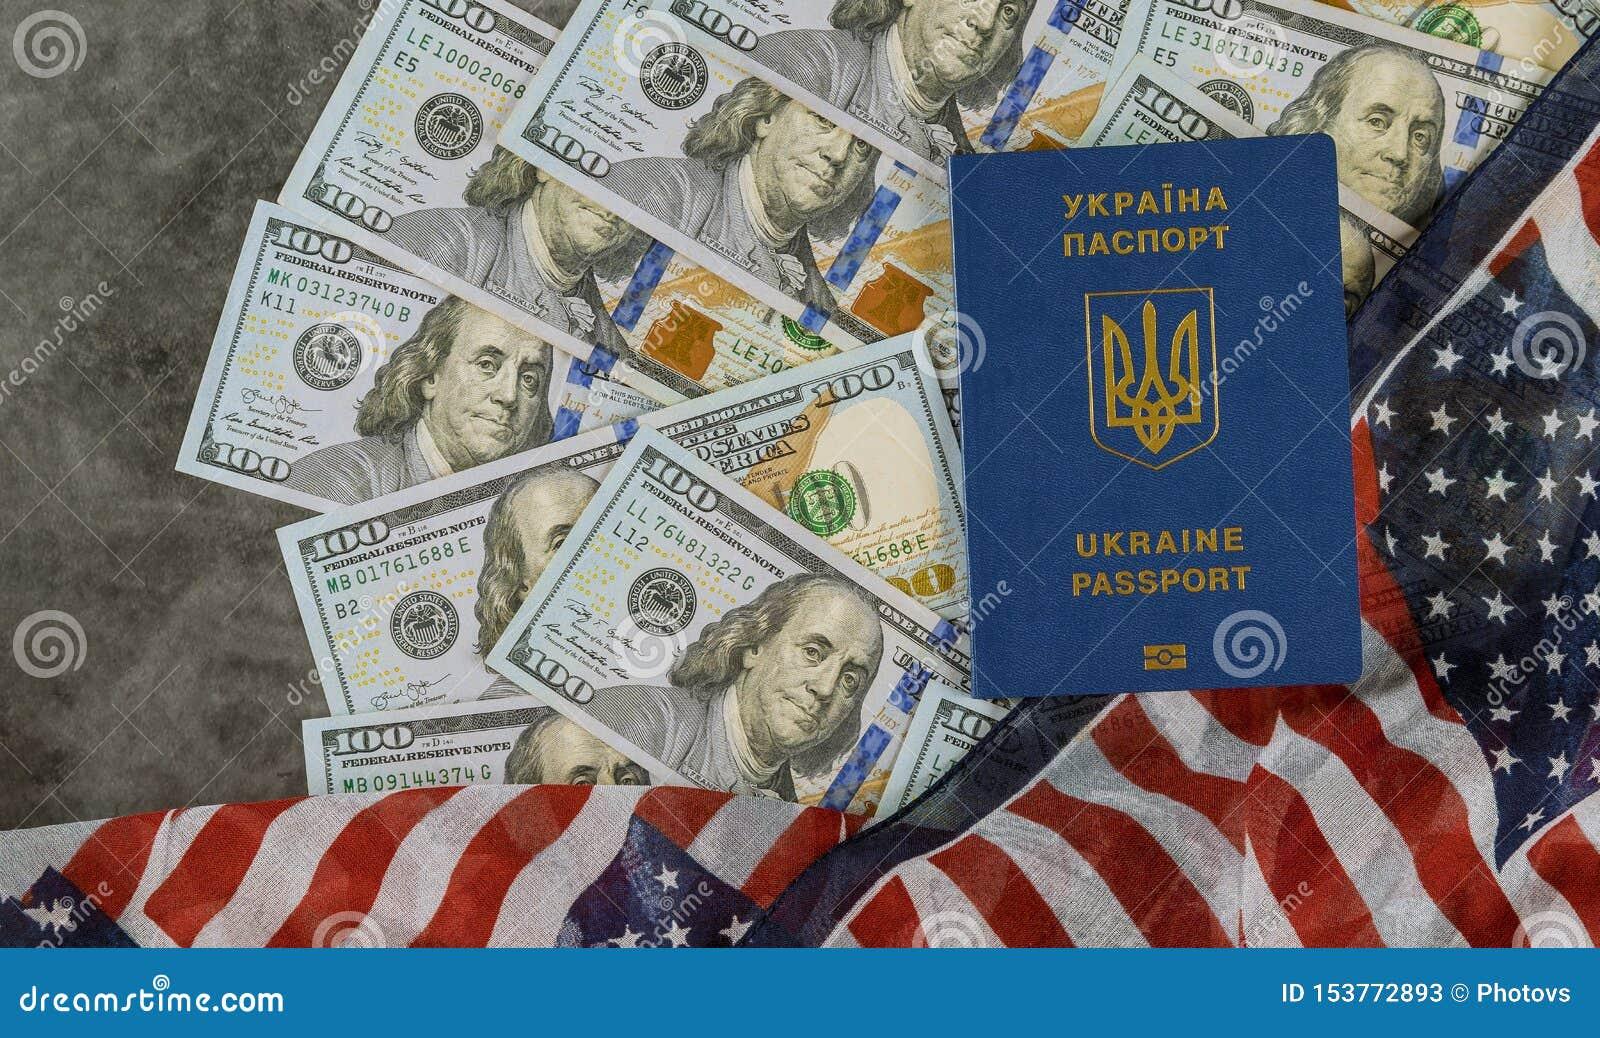 Ukrainian biometric passport in the US flag with bills of one hundred dollars